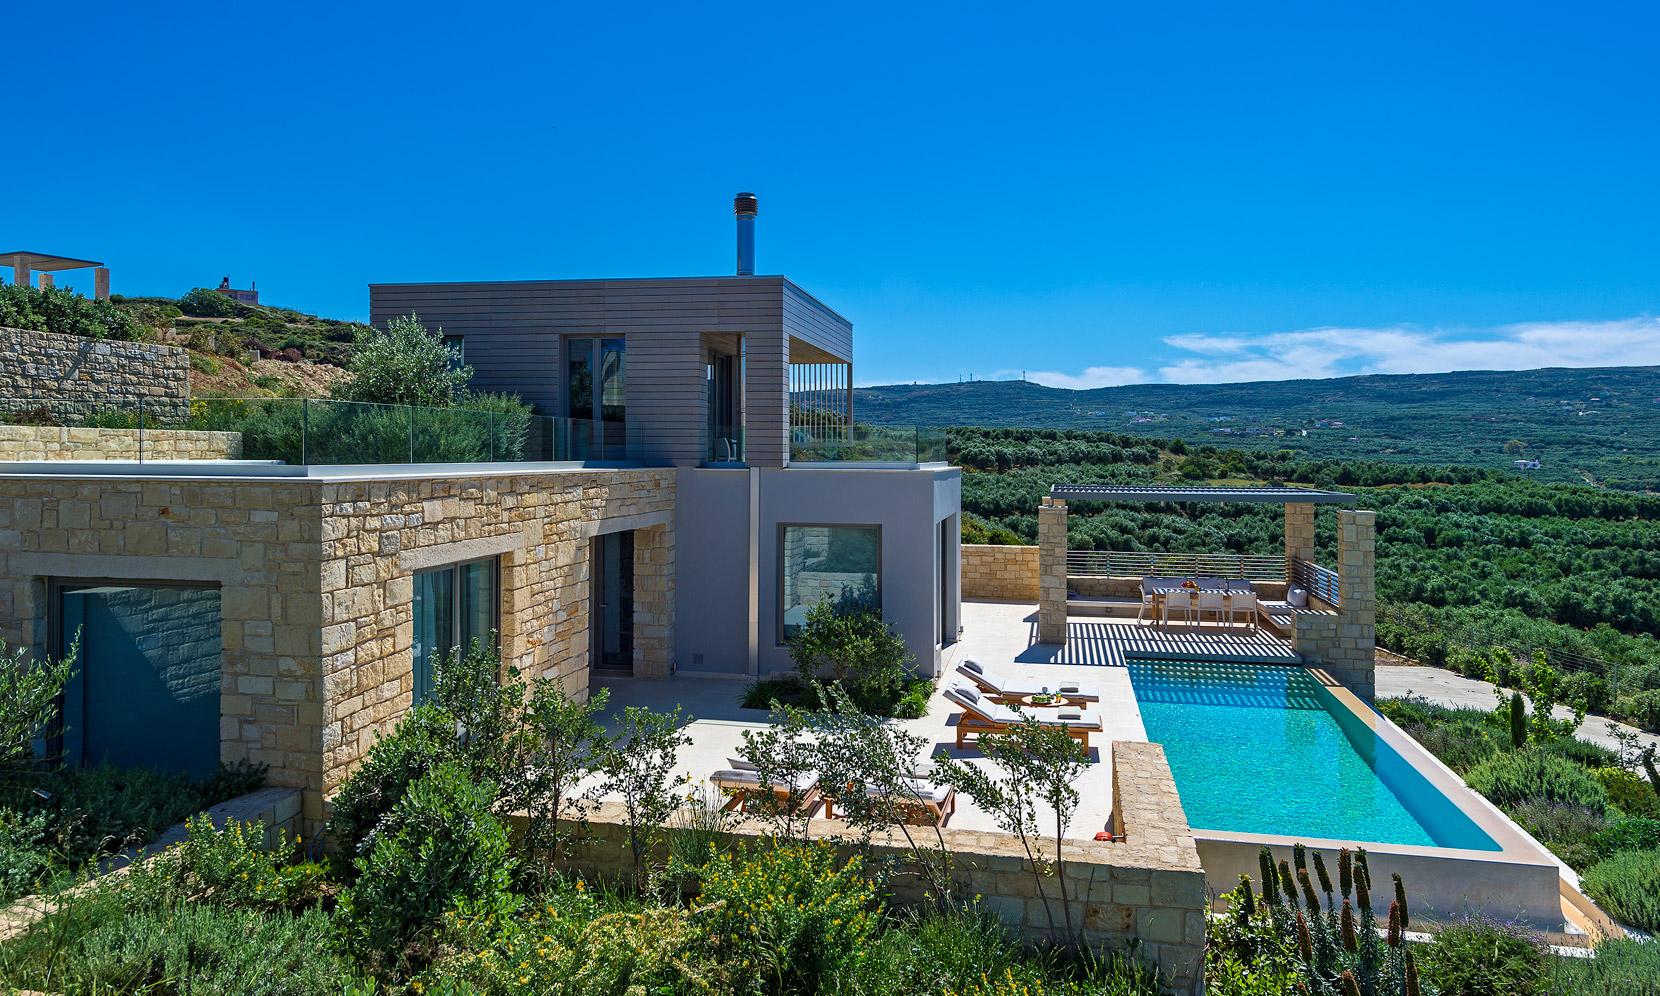 Crete Villa Papaya jumbotron image